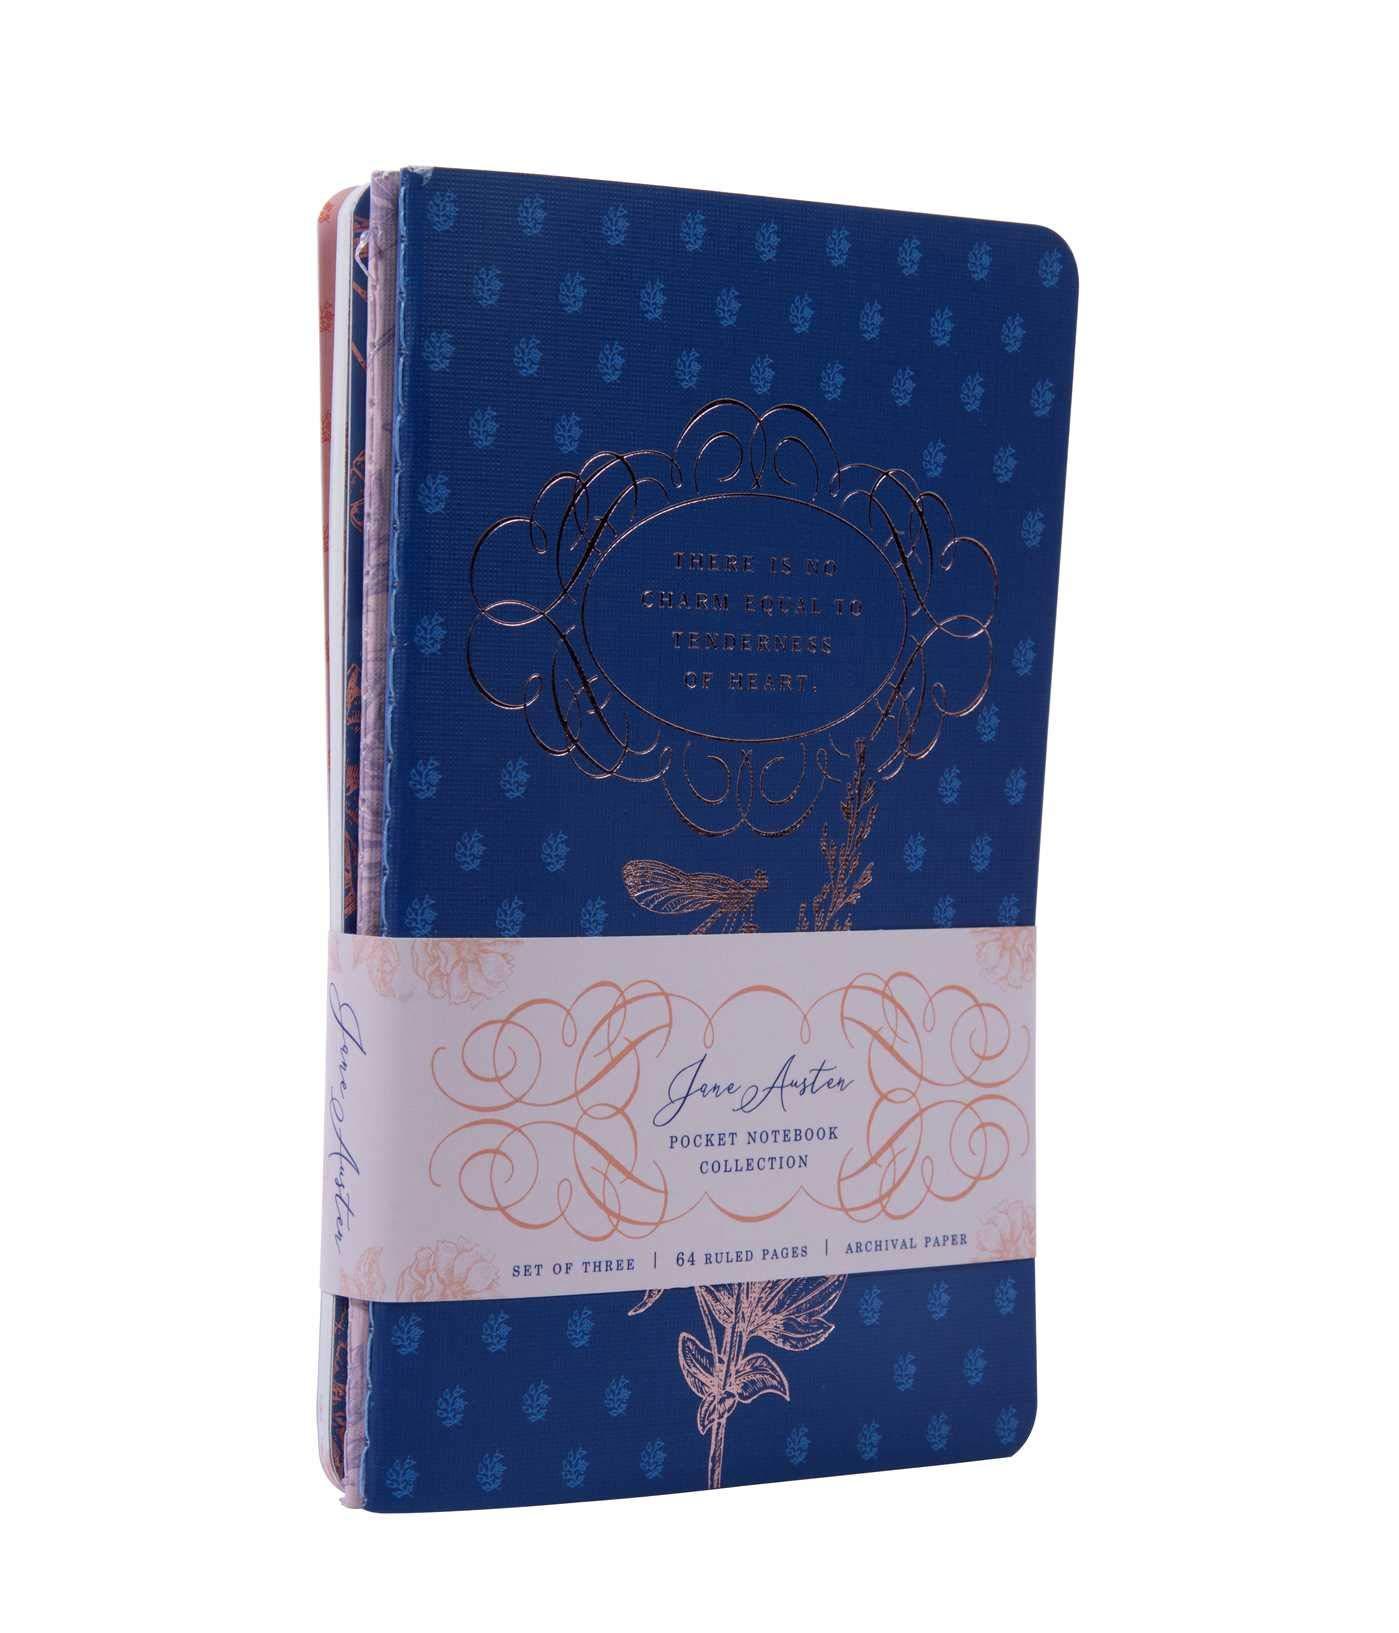 Jane Austen Sewn Pocket Notebook Collection: Set of 3 Jane Austen Card: Amazon.es: Insight Editions: Libros en idiomas extranjeros